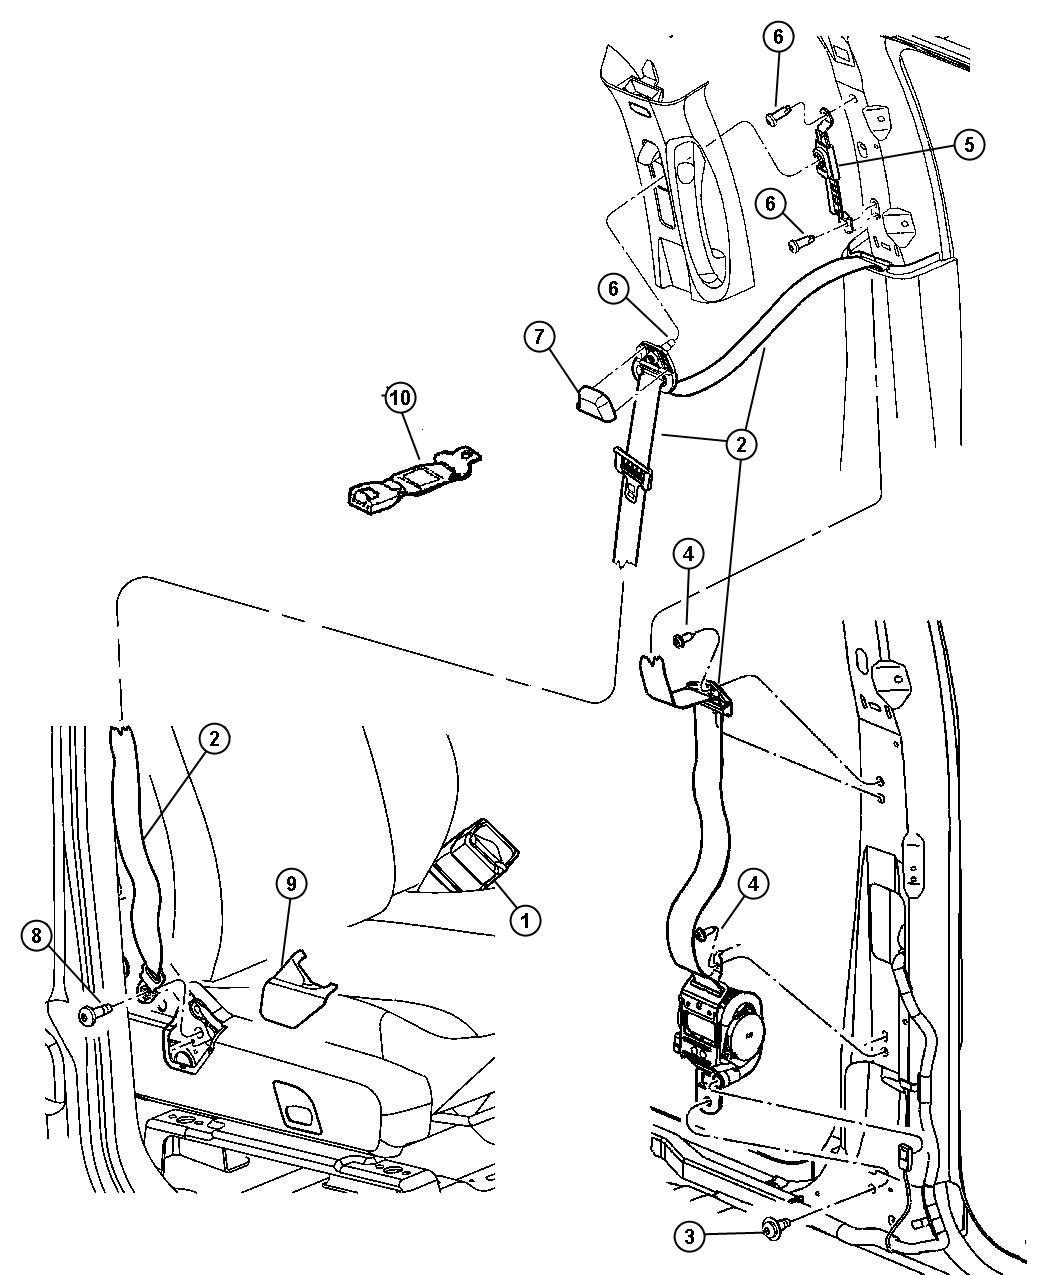 2005 Dodge Durango Limited 5 7l V8 4x4 Cover  Seat Belt Anchor  Left   J1   Trim   All Trim